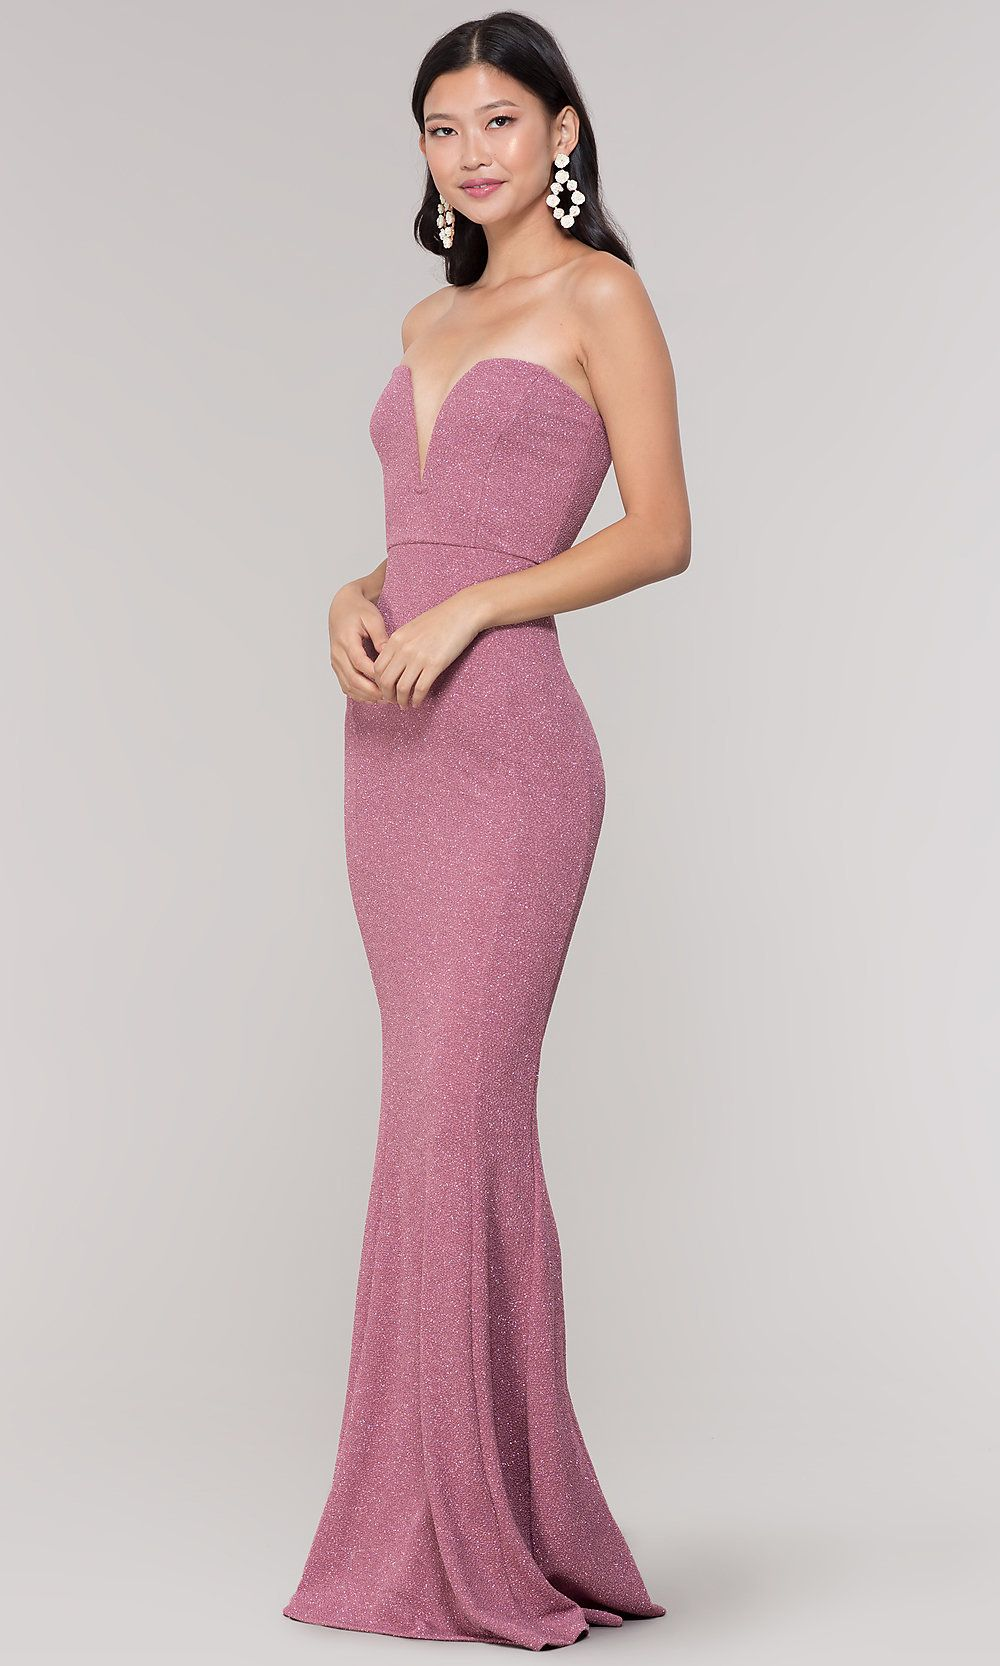 Strapless Deep Sweetheart Long Mermaid Prom Dress Prom Dresses Long Mermaid Mermaid Prom Dresses Strapless Prom Dresses [ 1666 x 1000 Pixel ]